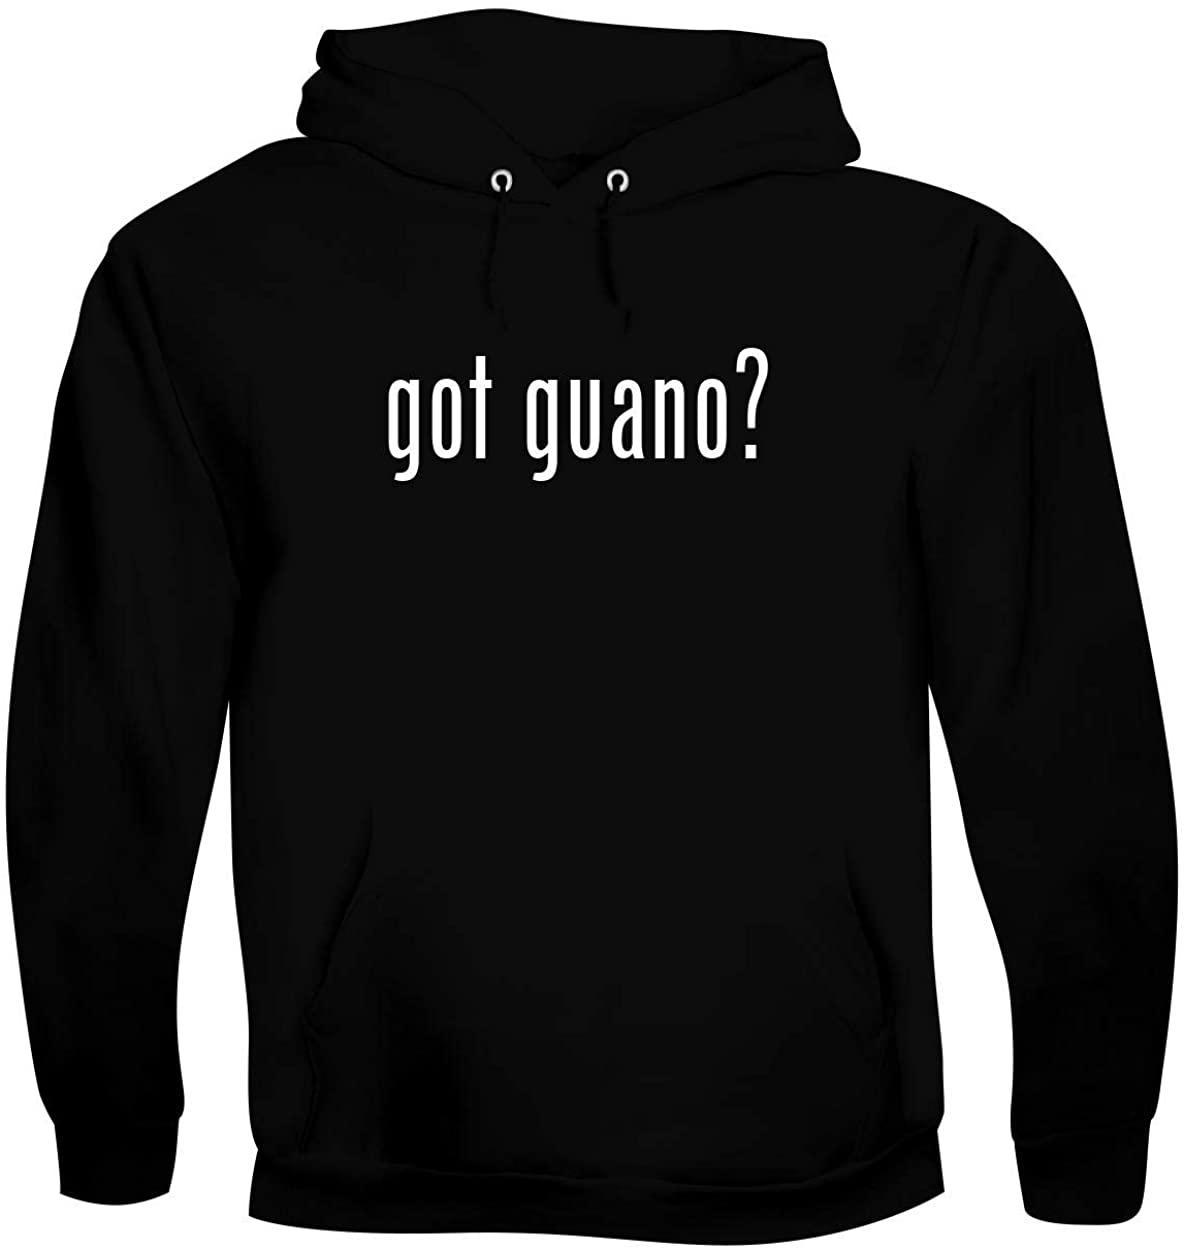 got guano? - Mens Soft & Comfortable Hoodie Sweatshirt